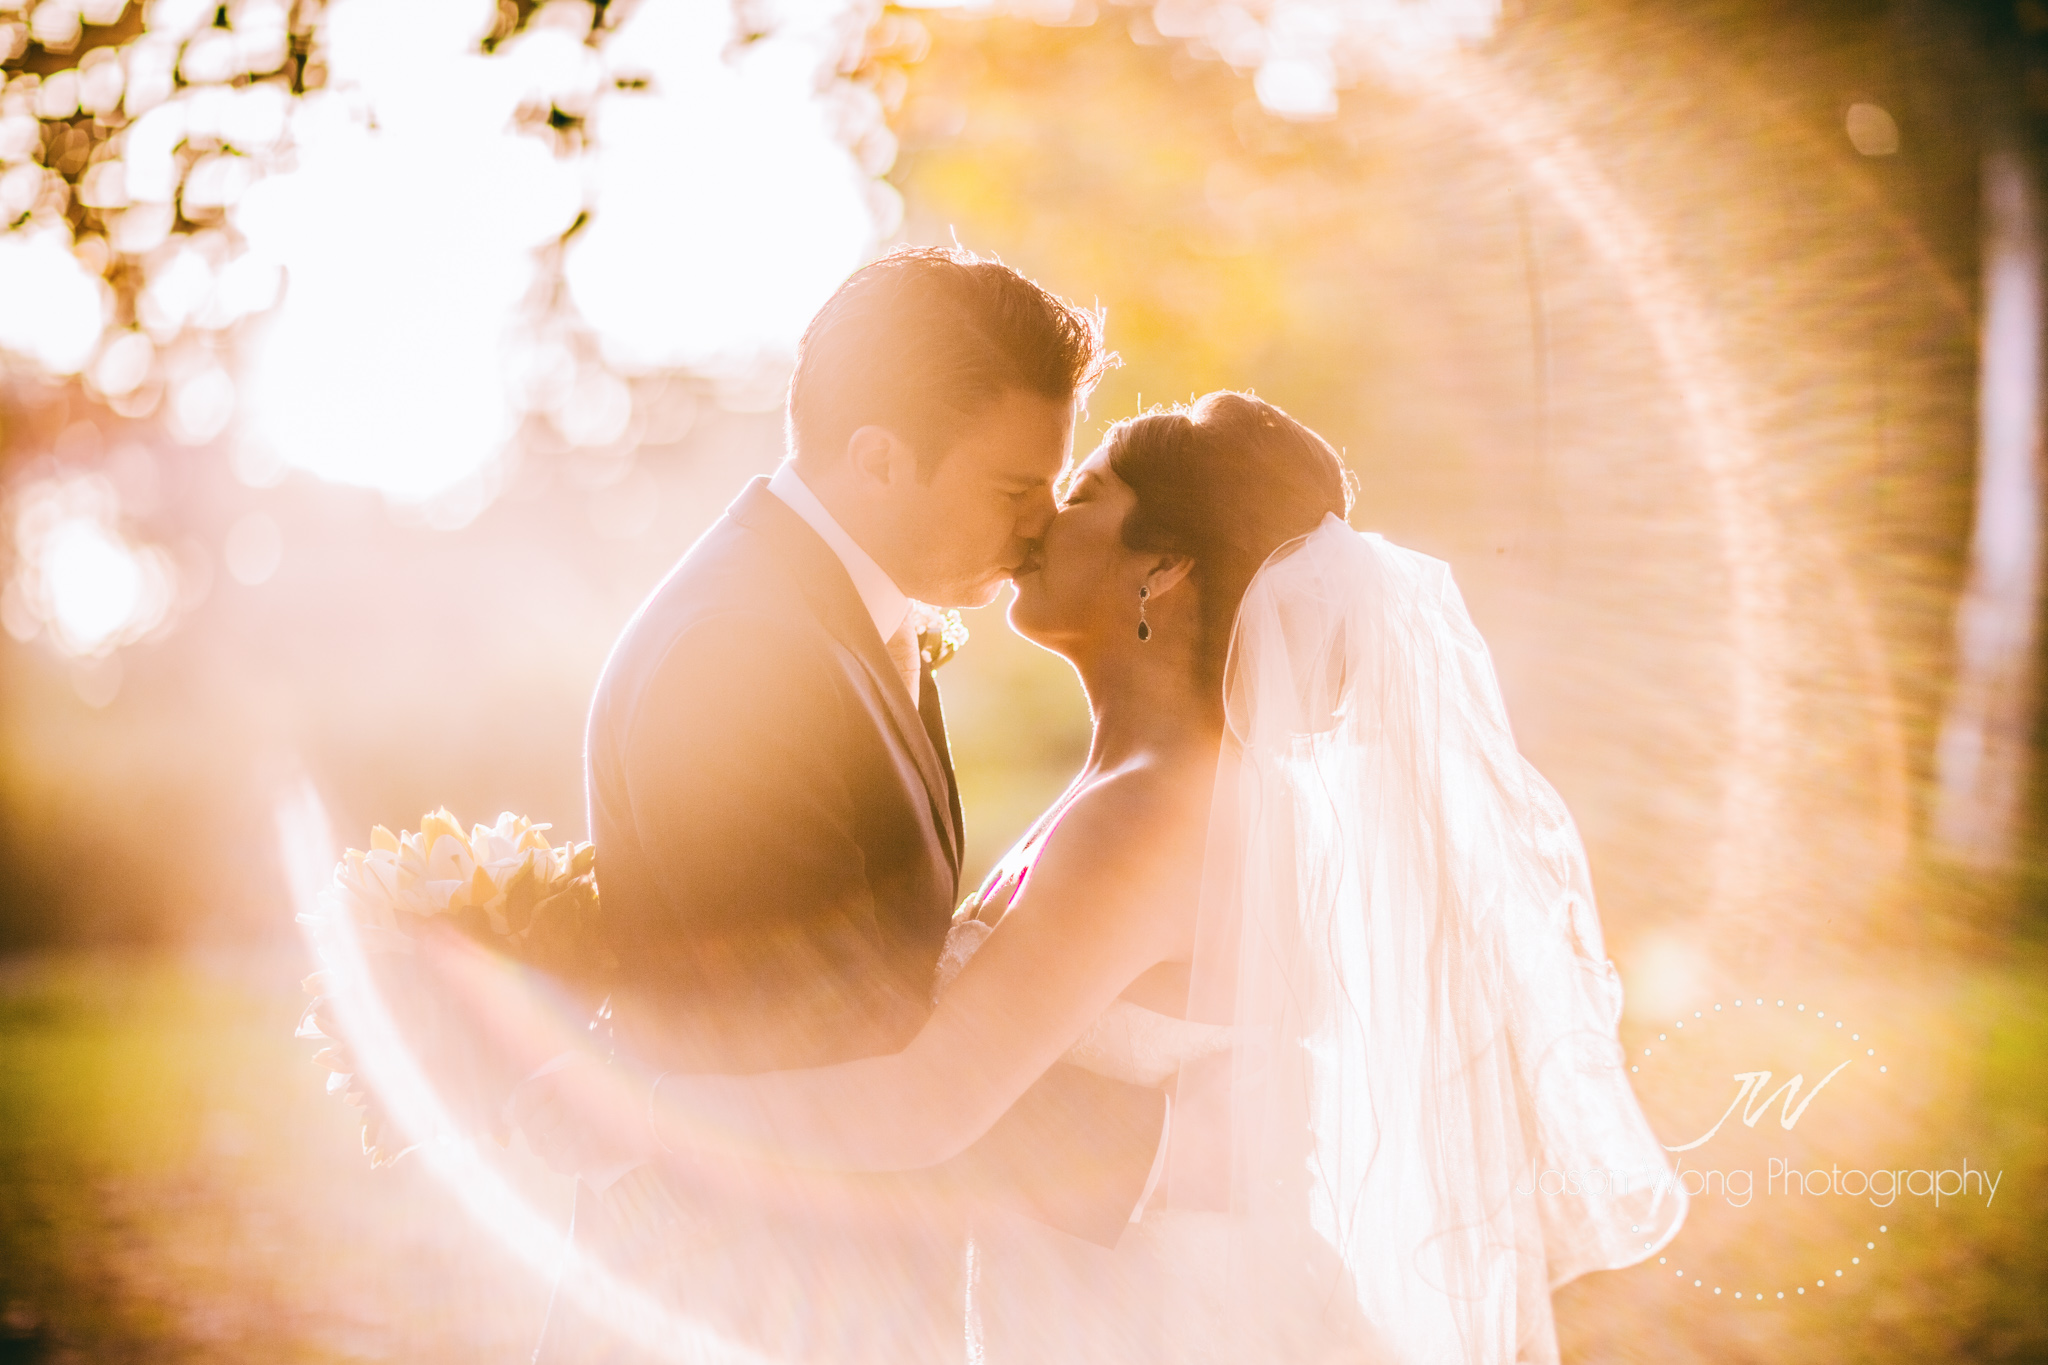 sunset-romantic-kiss-halo.jpg